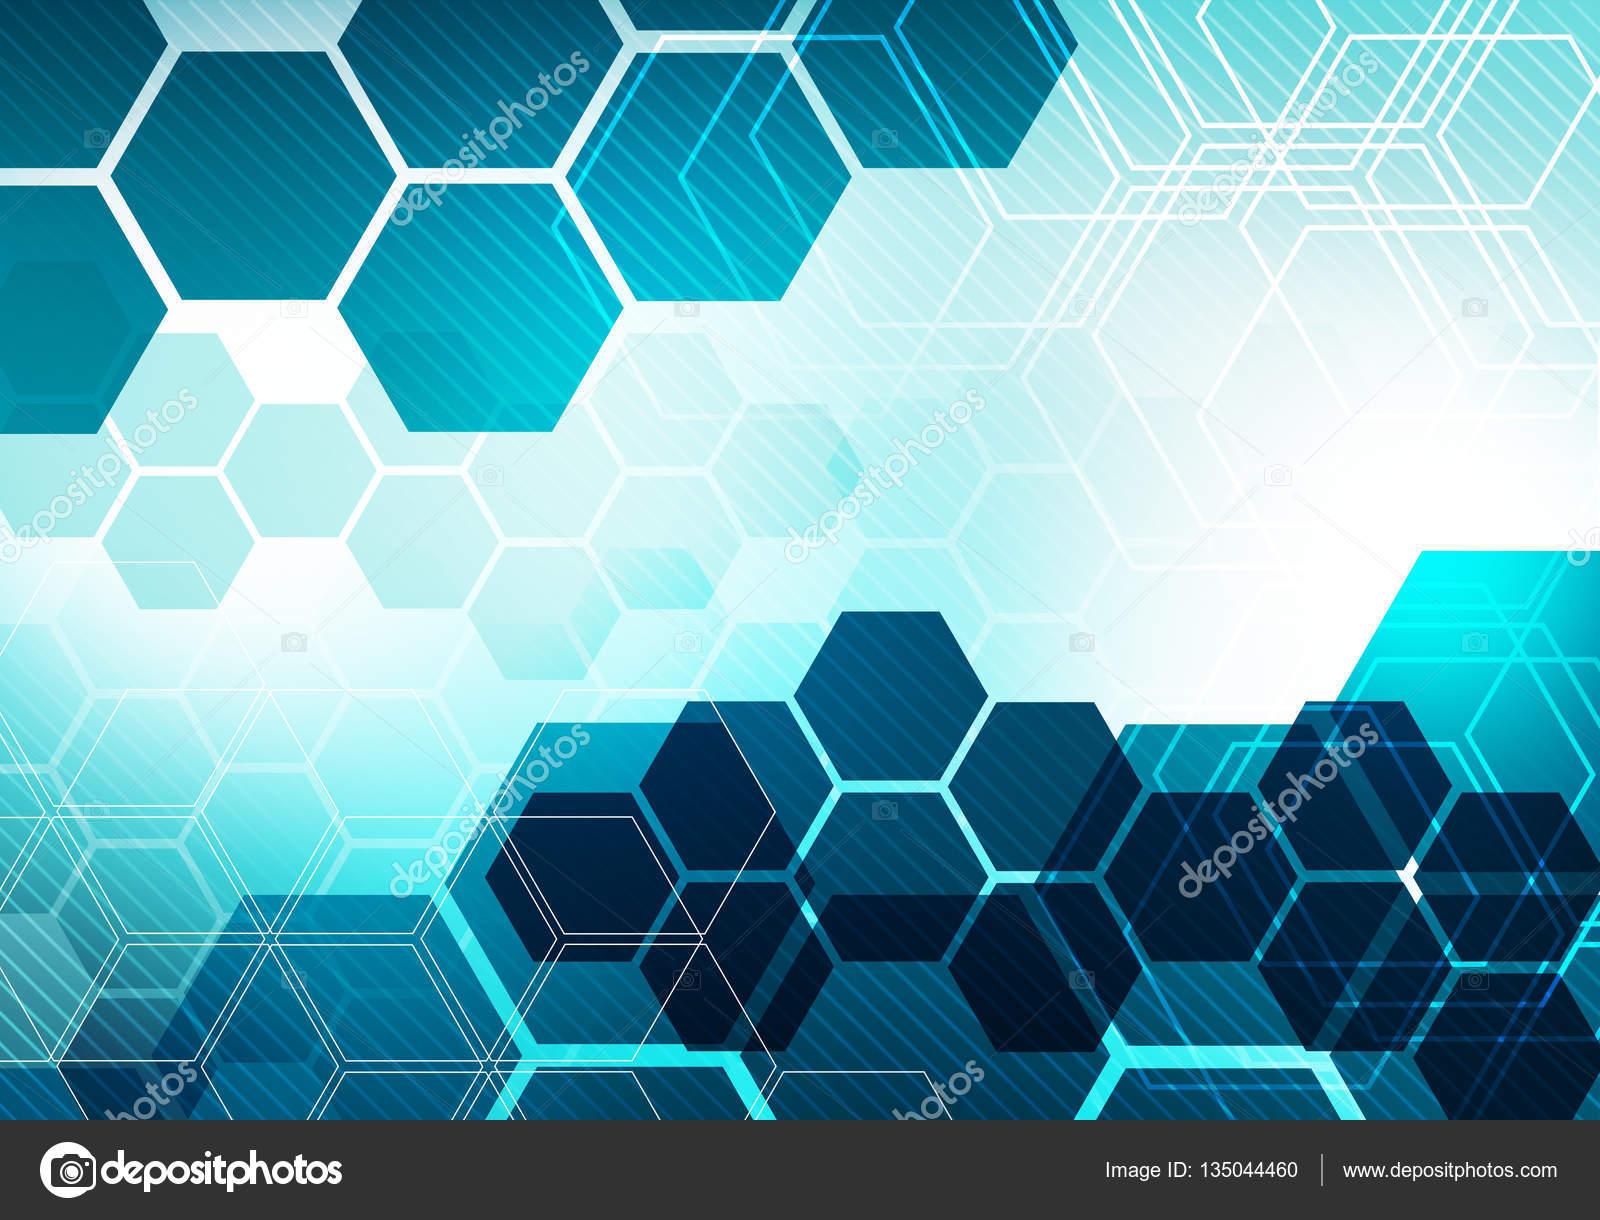 Conceito Digital Hexágono Negócios Tecnologia Plano De